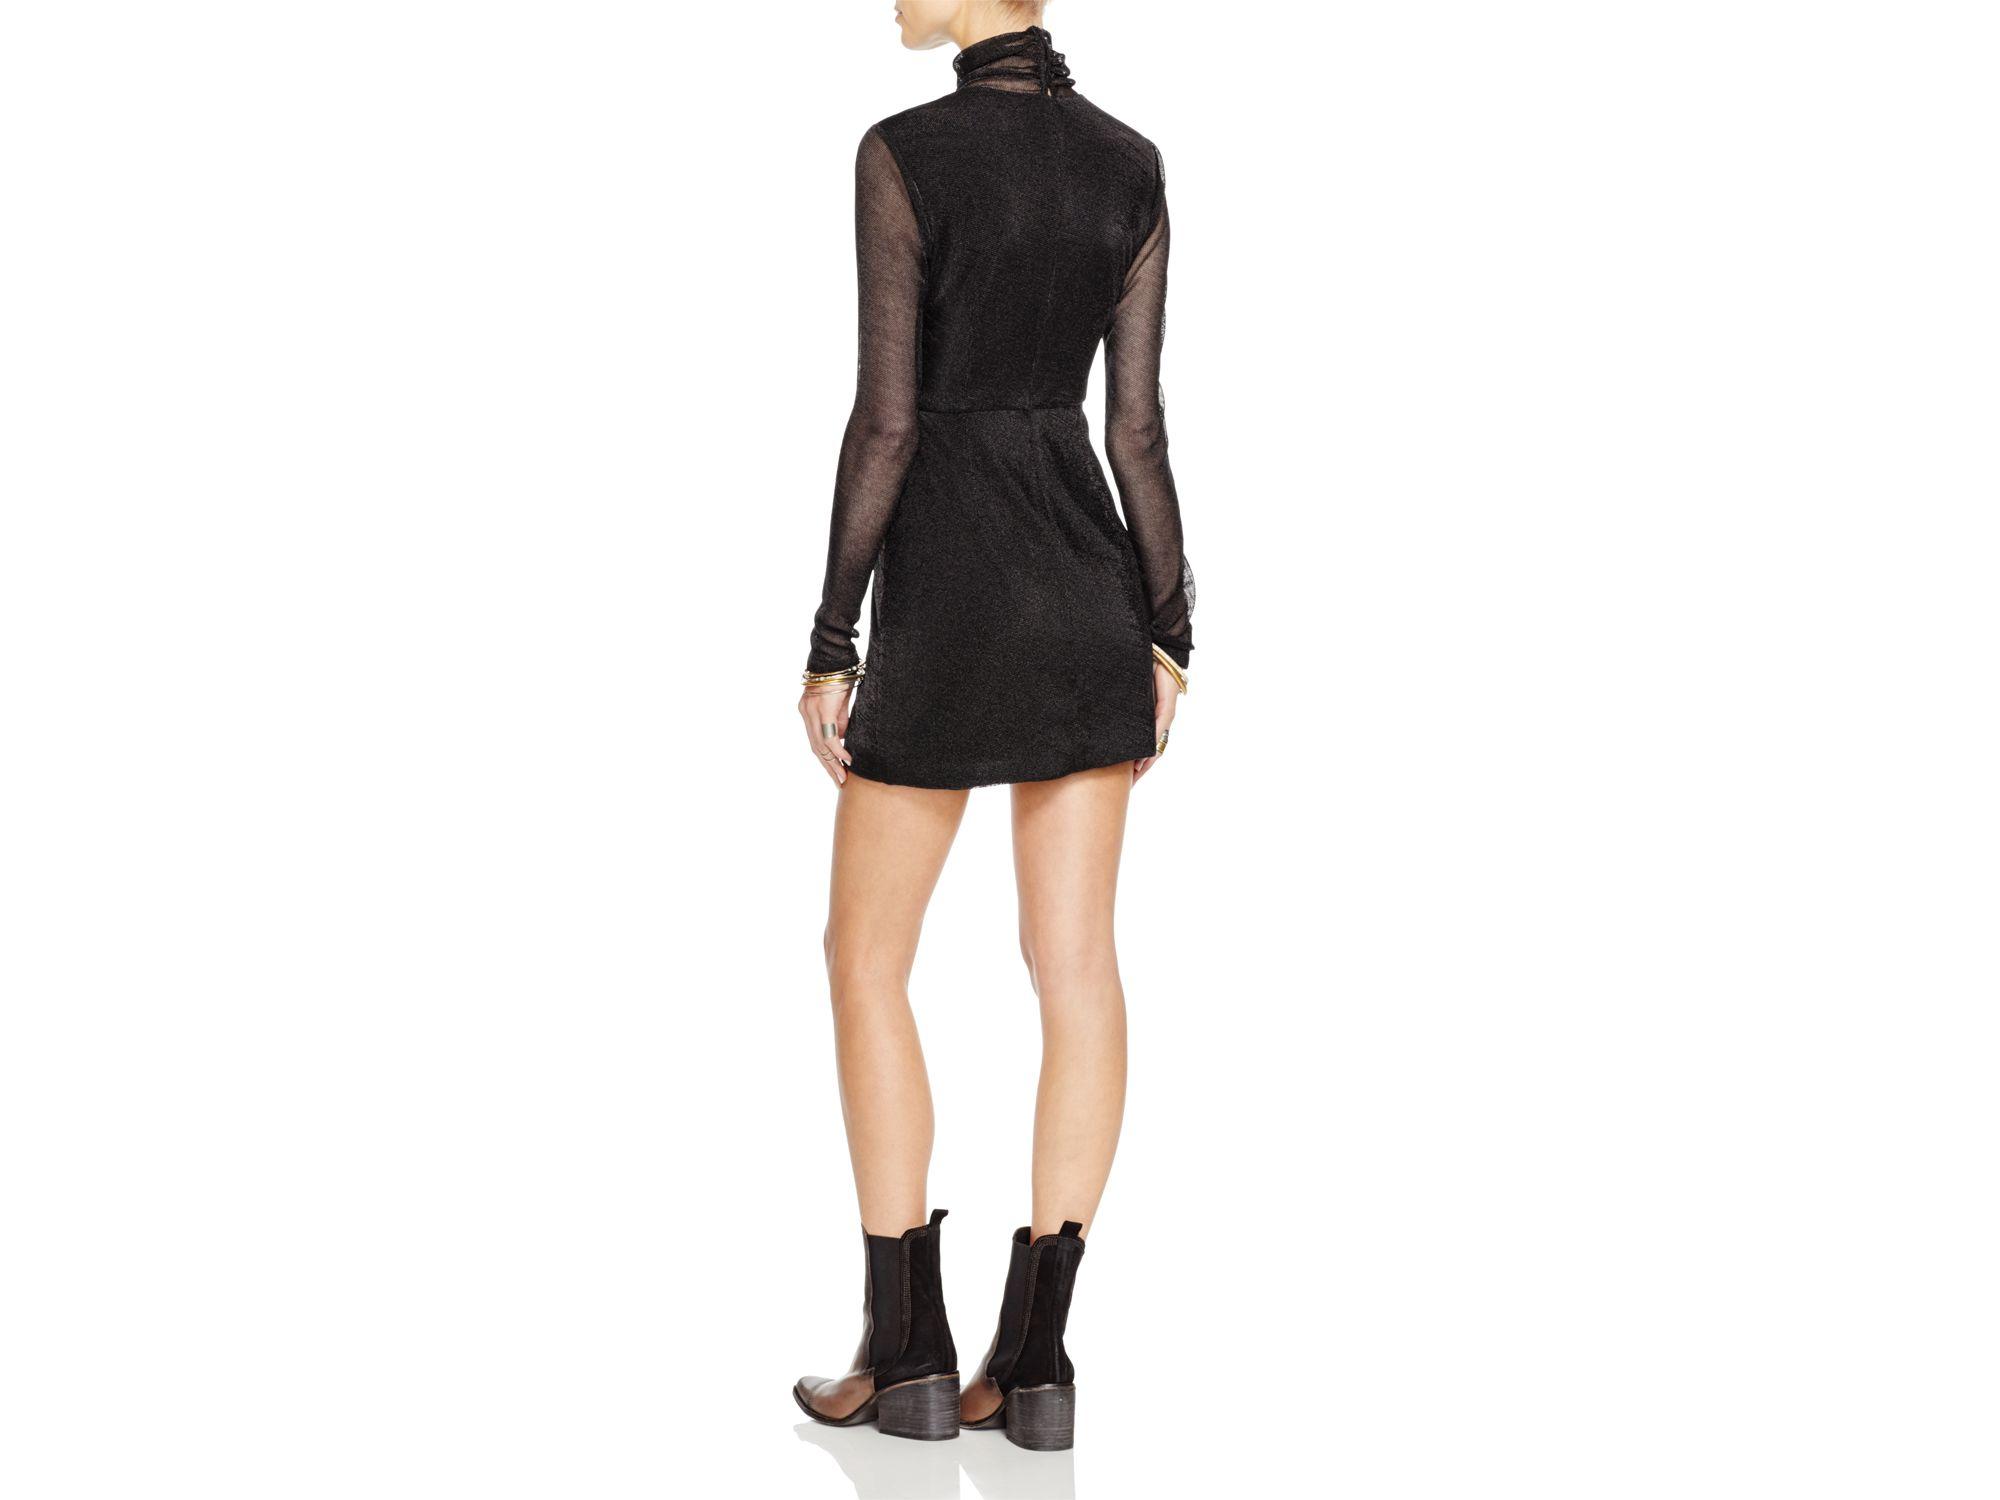 Free people Mercury Bodycon Dress in Black | Lyst